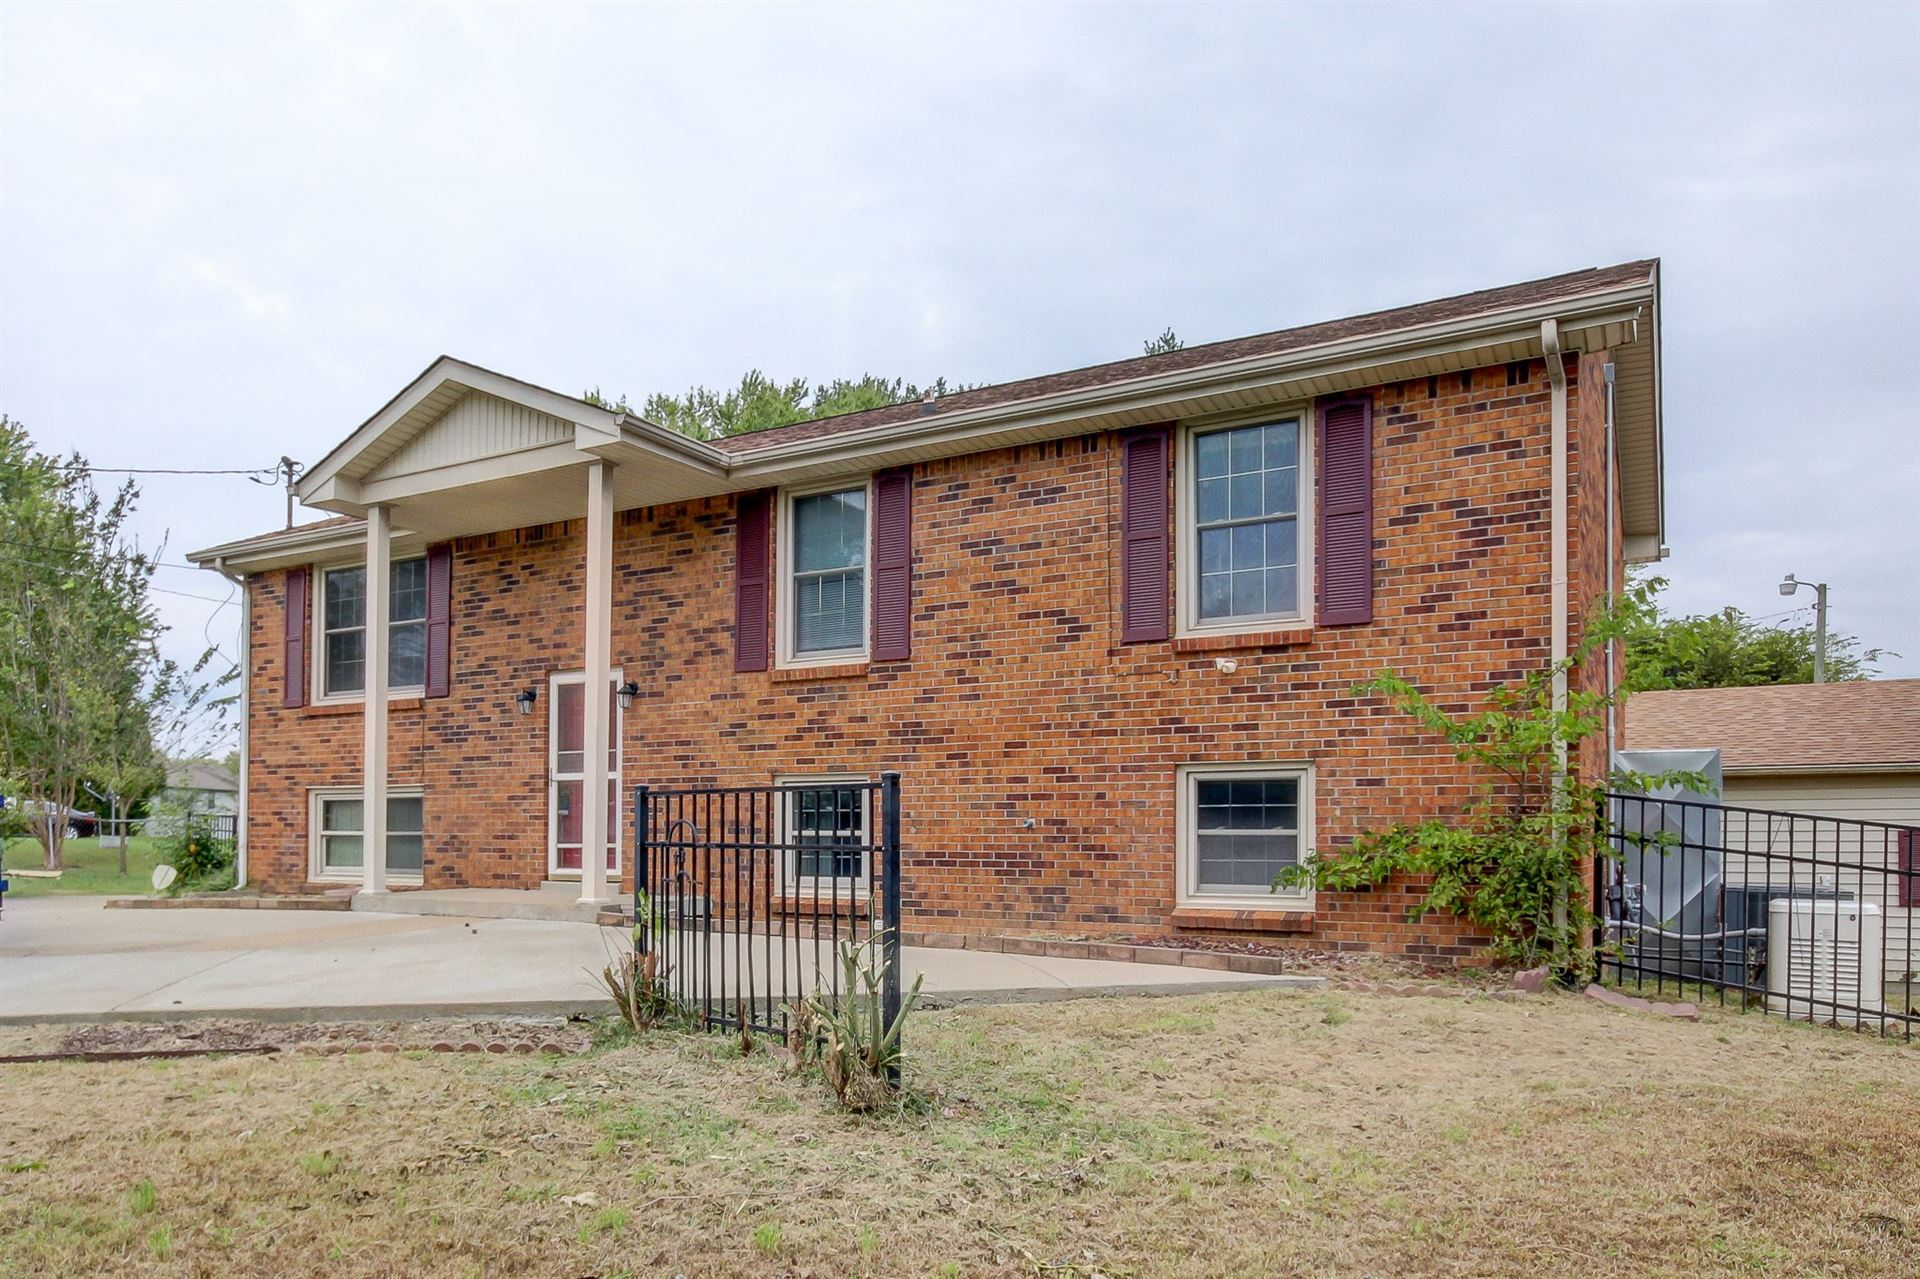 307 Ridgeline Dr, Clarksville, TN 37042 - MLS#: 2300525